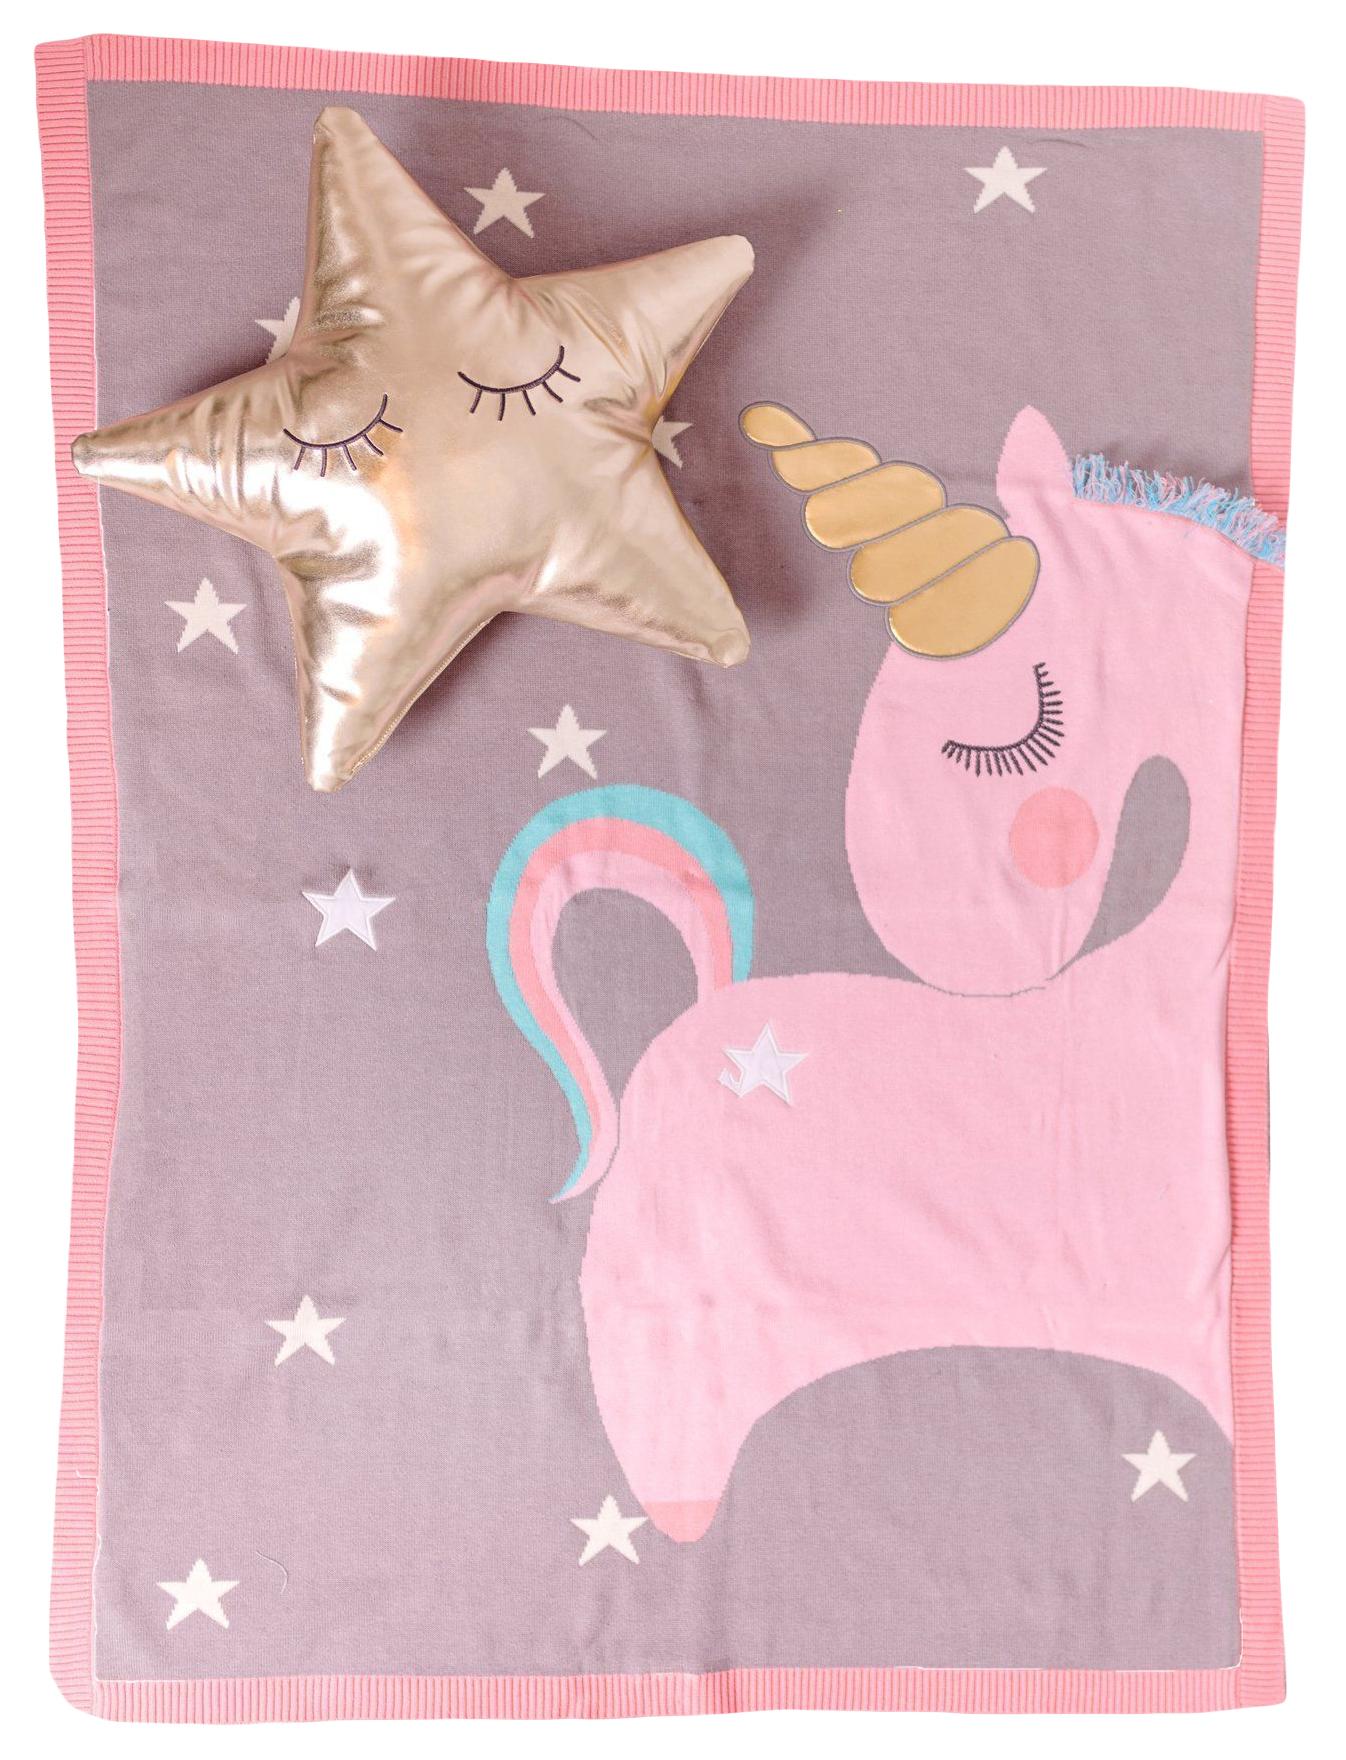 Купить Одеяло Bizzi Growin (Биззи Гровин) Unicorn вязаное 70*90 BG006, Одеяла для новорожденных